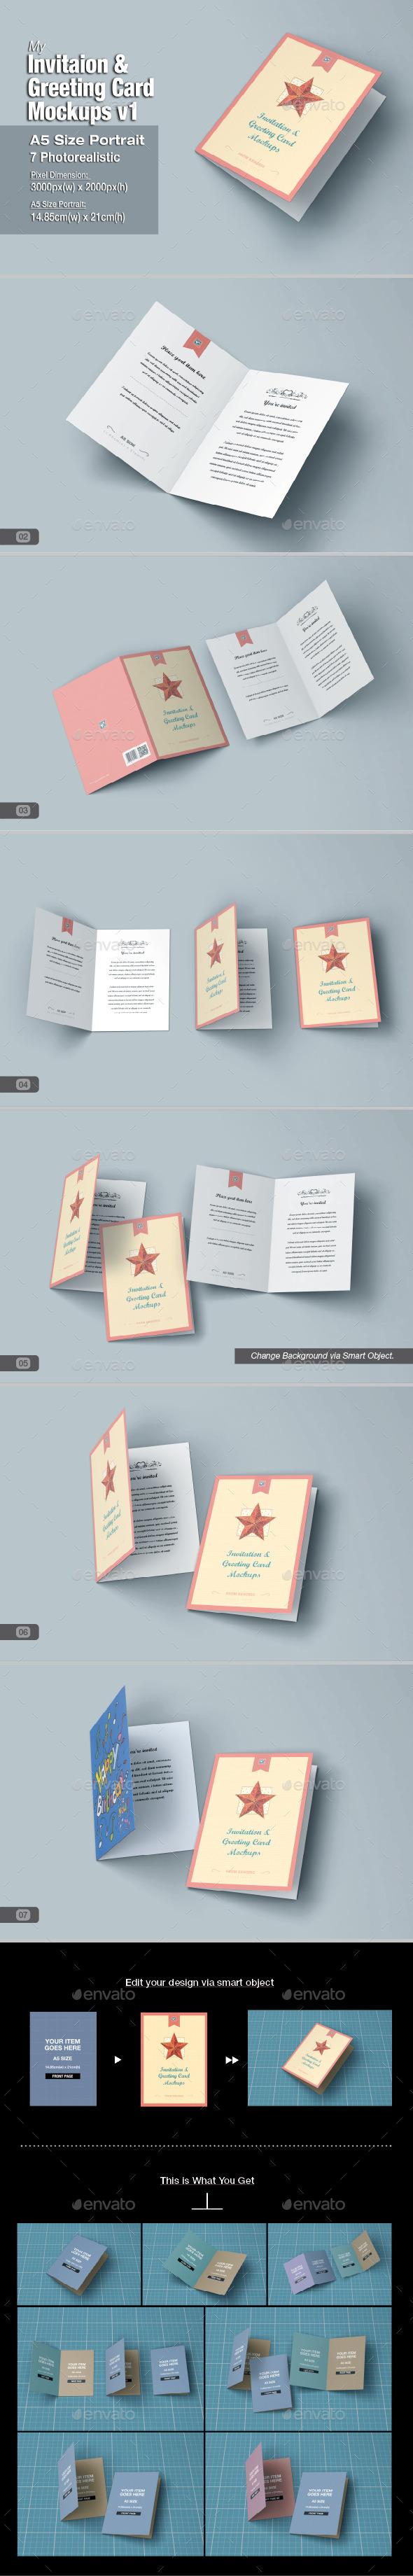 GraphicRiver myGreeting Card Mock-up v1 10988284